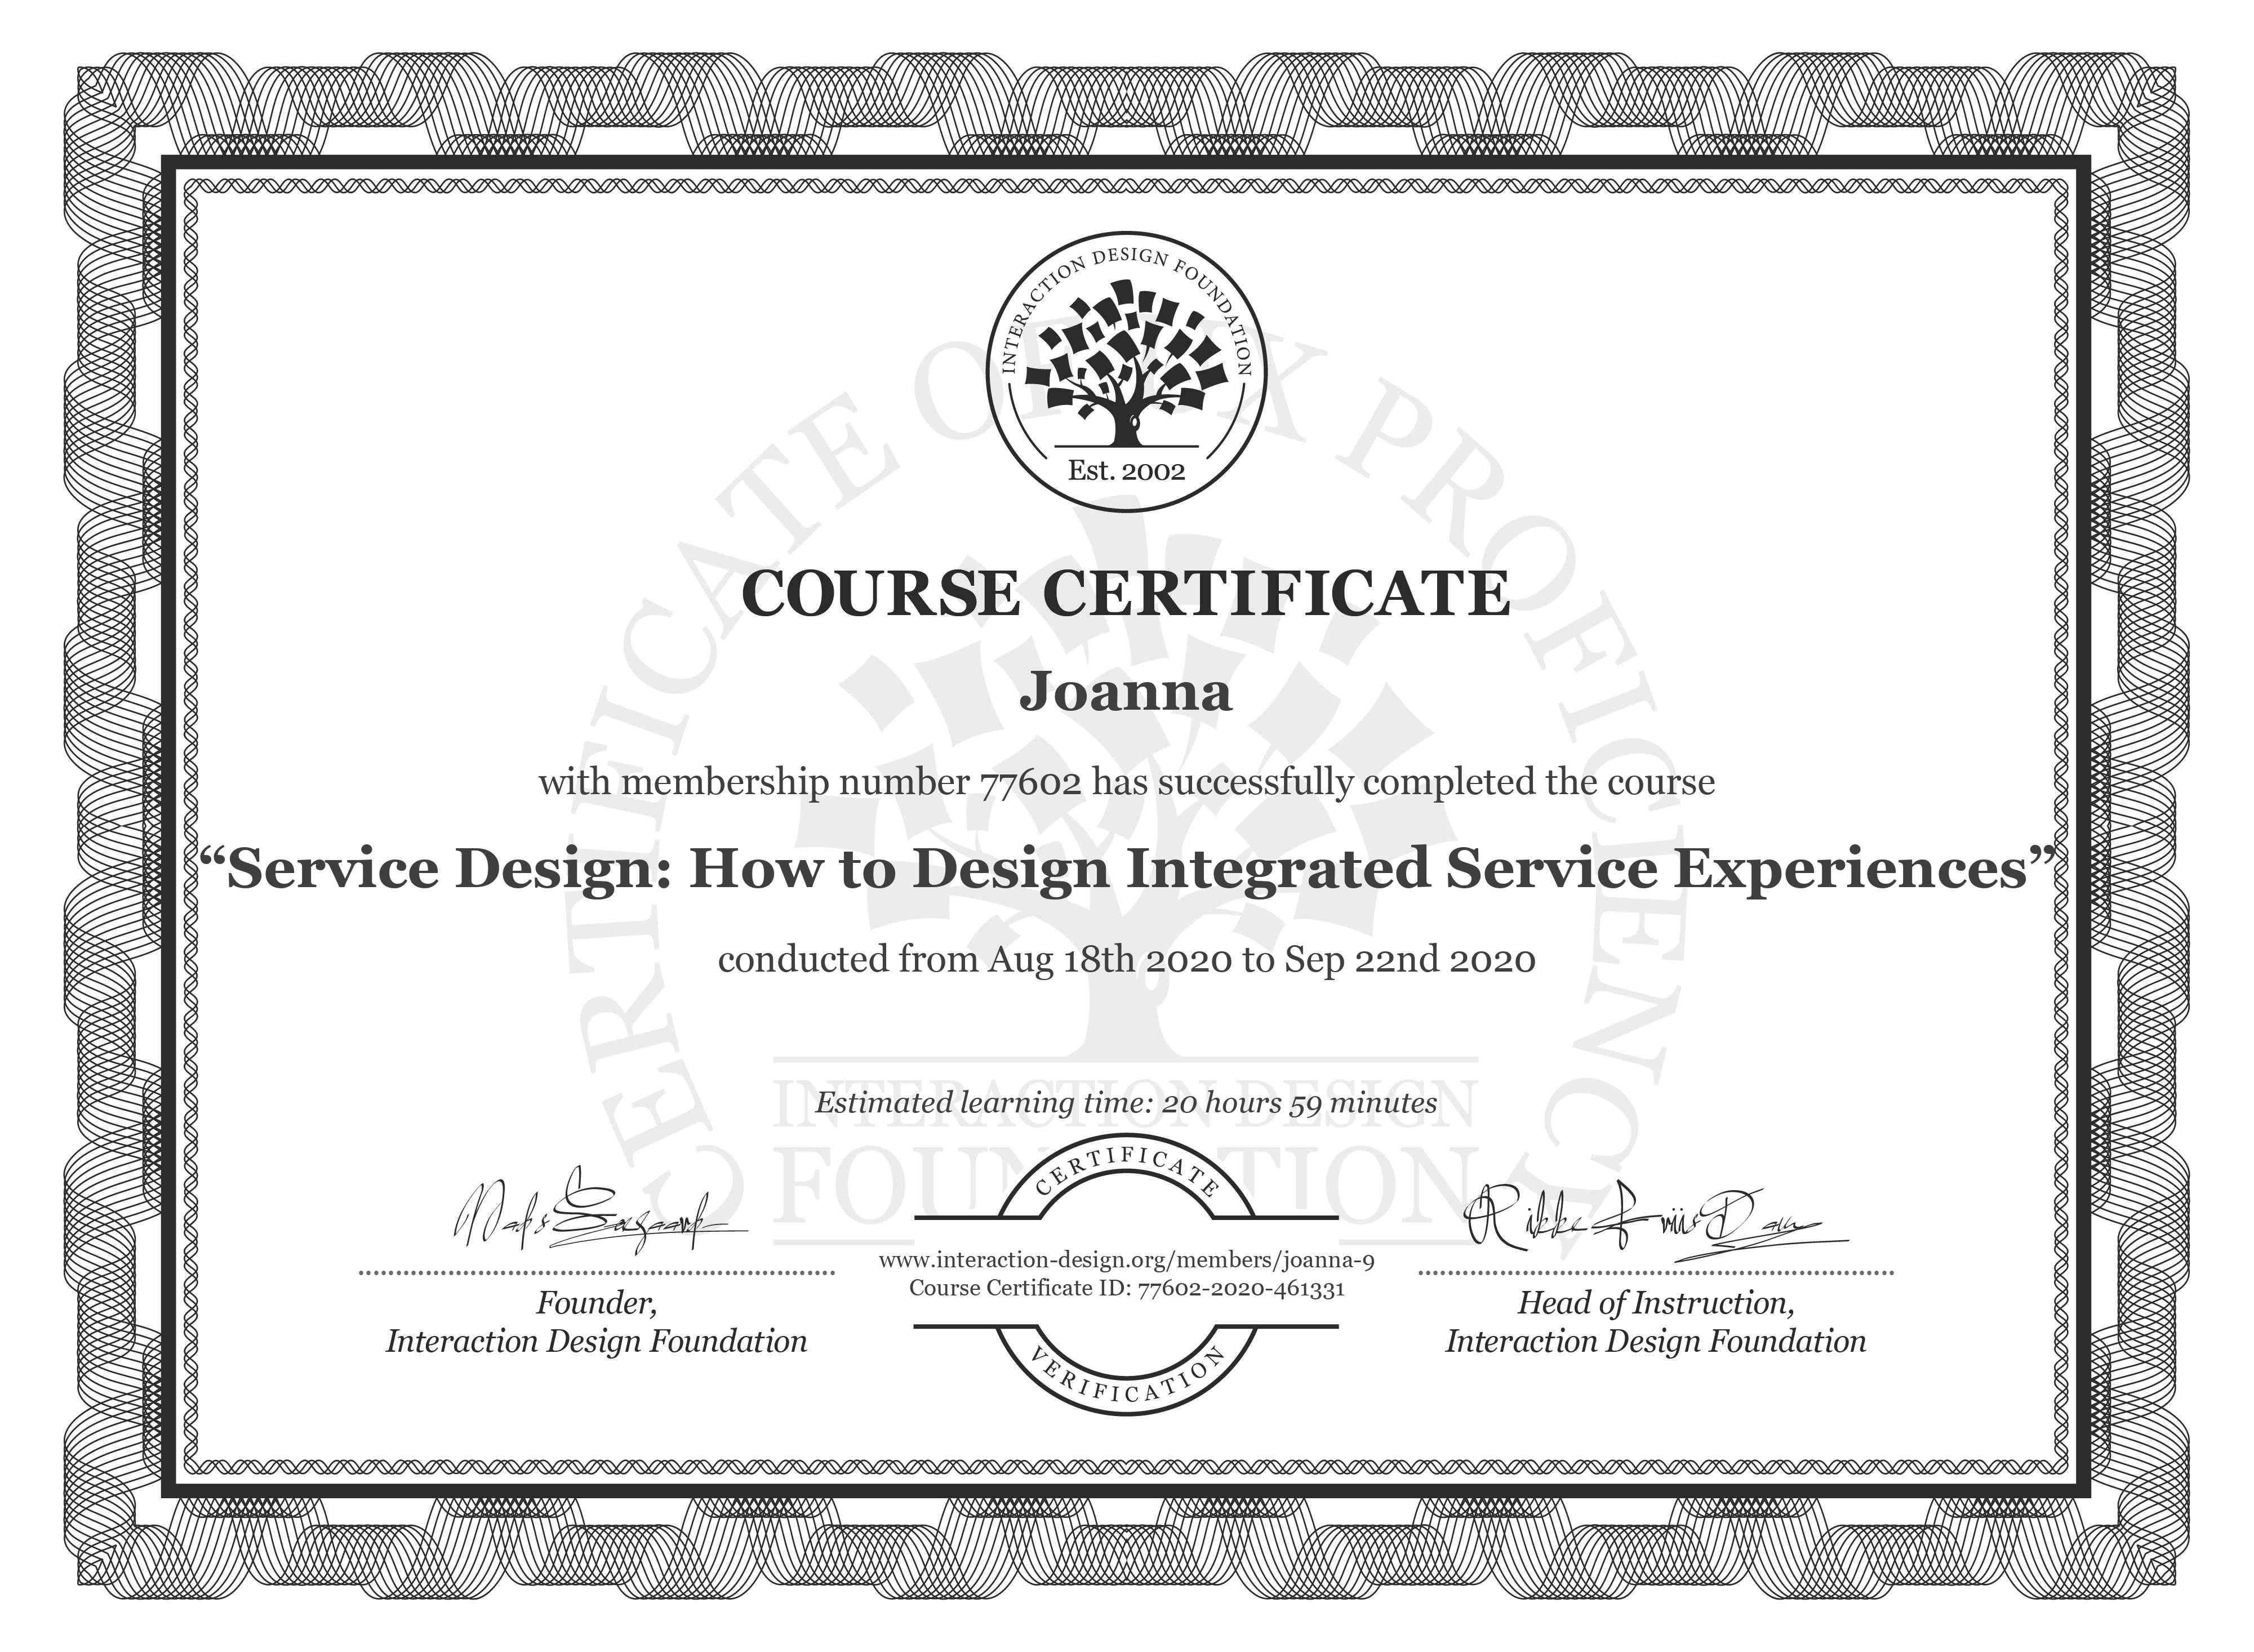 Joanna's Course Certificate: Service Design: Delivering Integrated Service Experiences